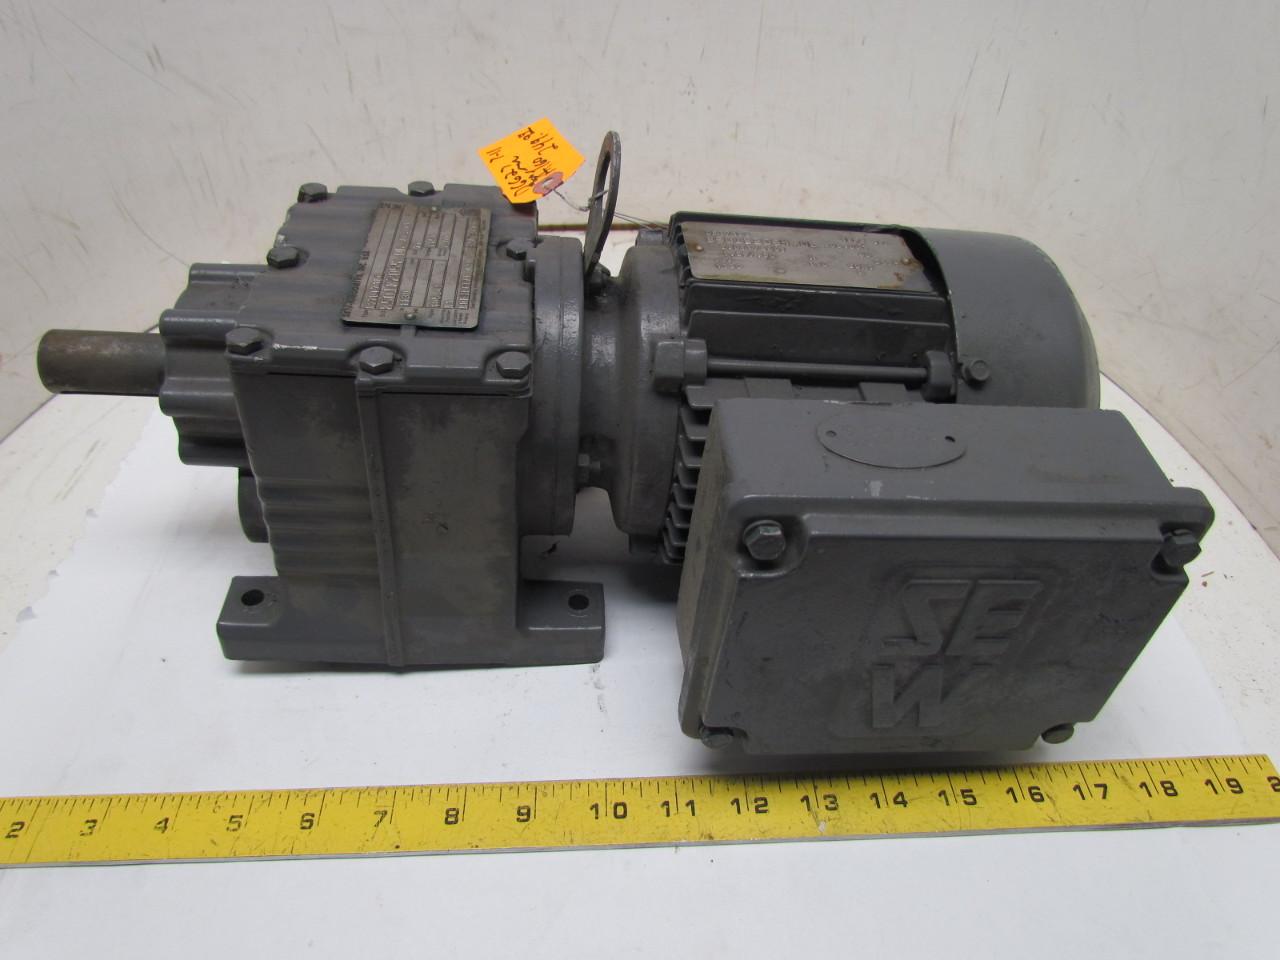 Sew eurodrive dft71d6 3 phase gear motor 33hp 1130 rpm 230 for Sew eurodrive gear motor